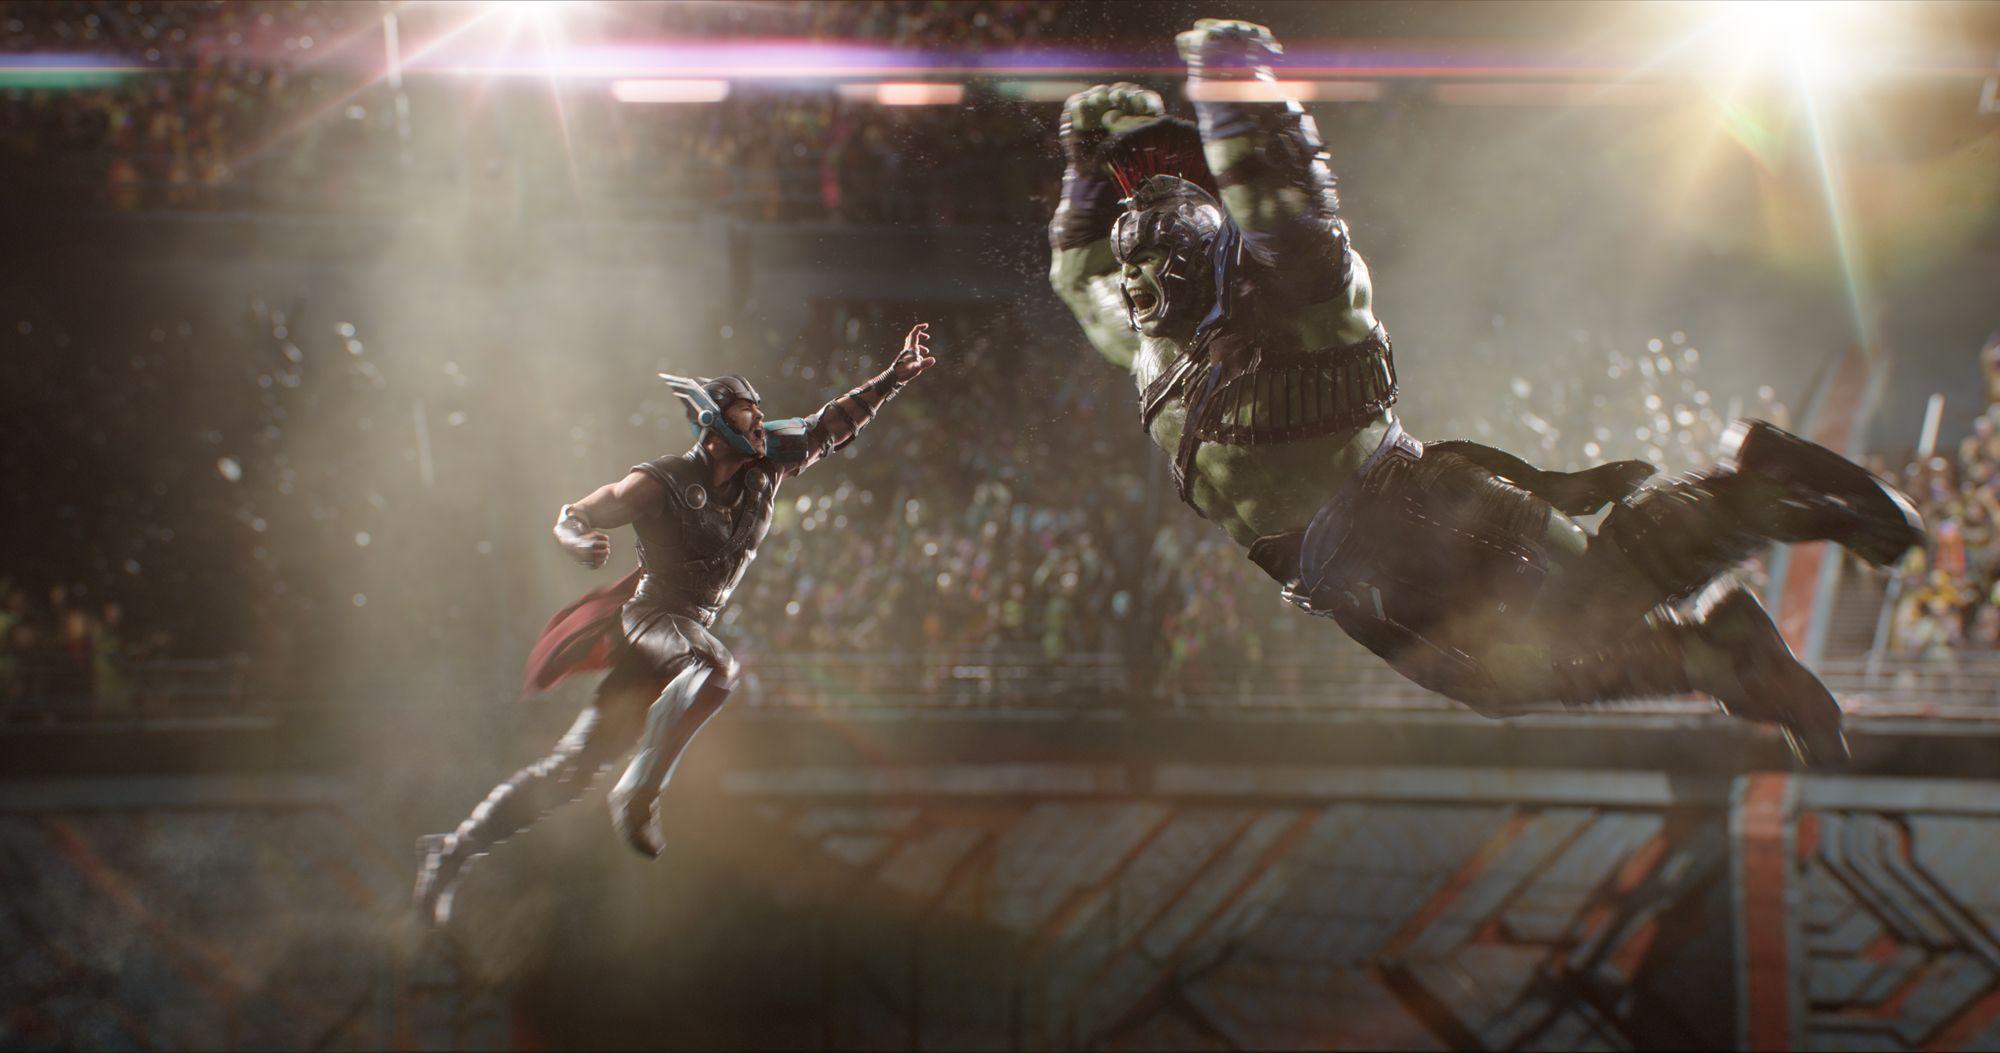 Resultado de imagen de thor : ragnarok hulk